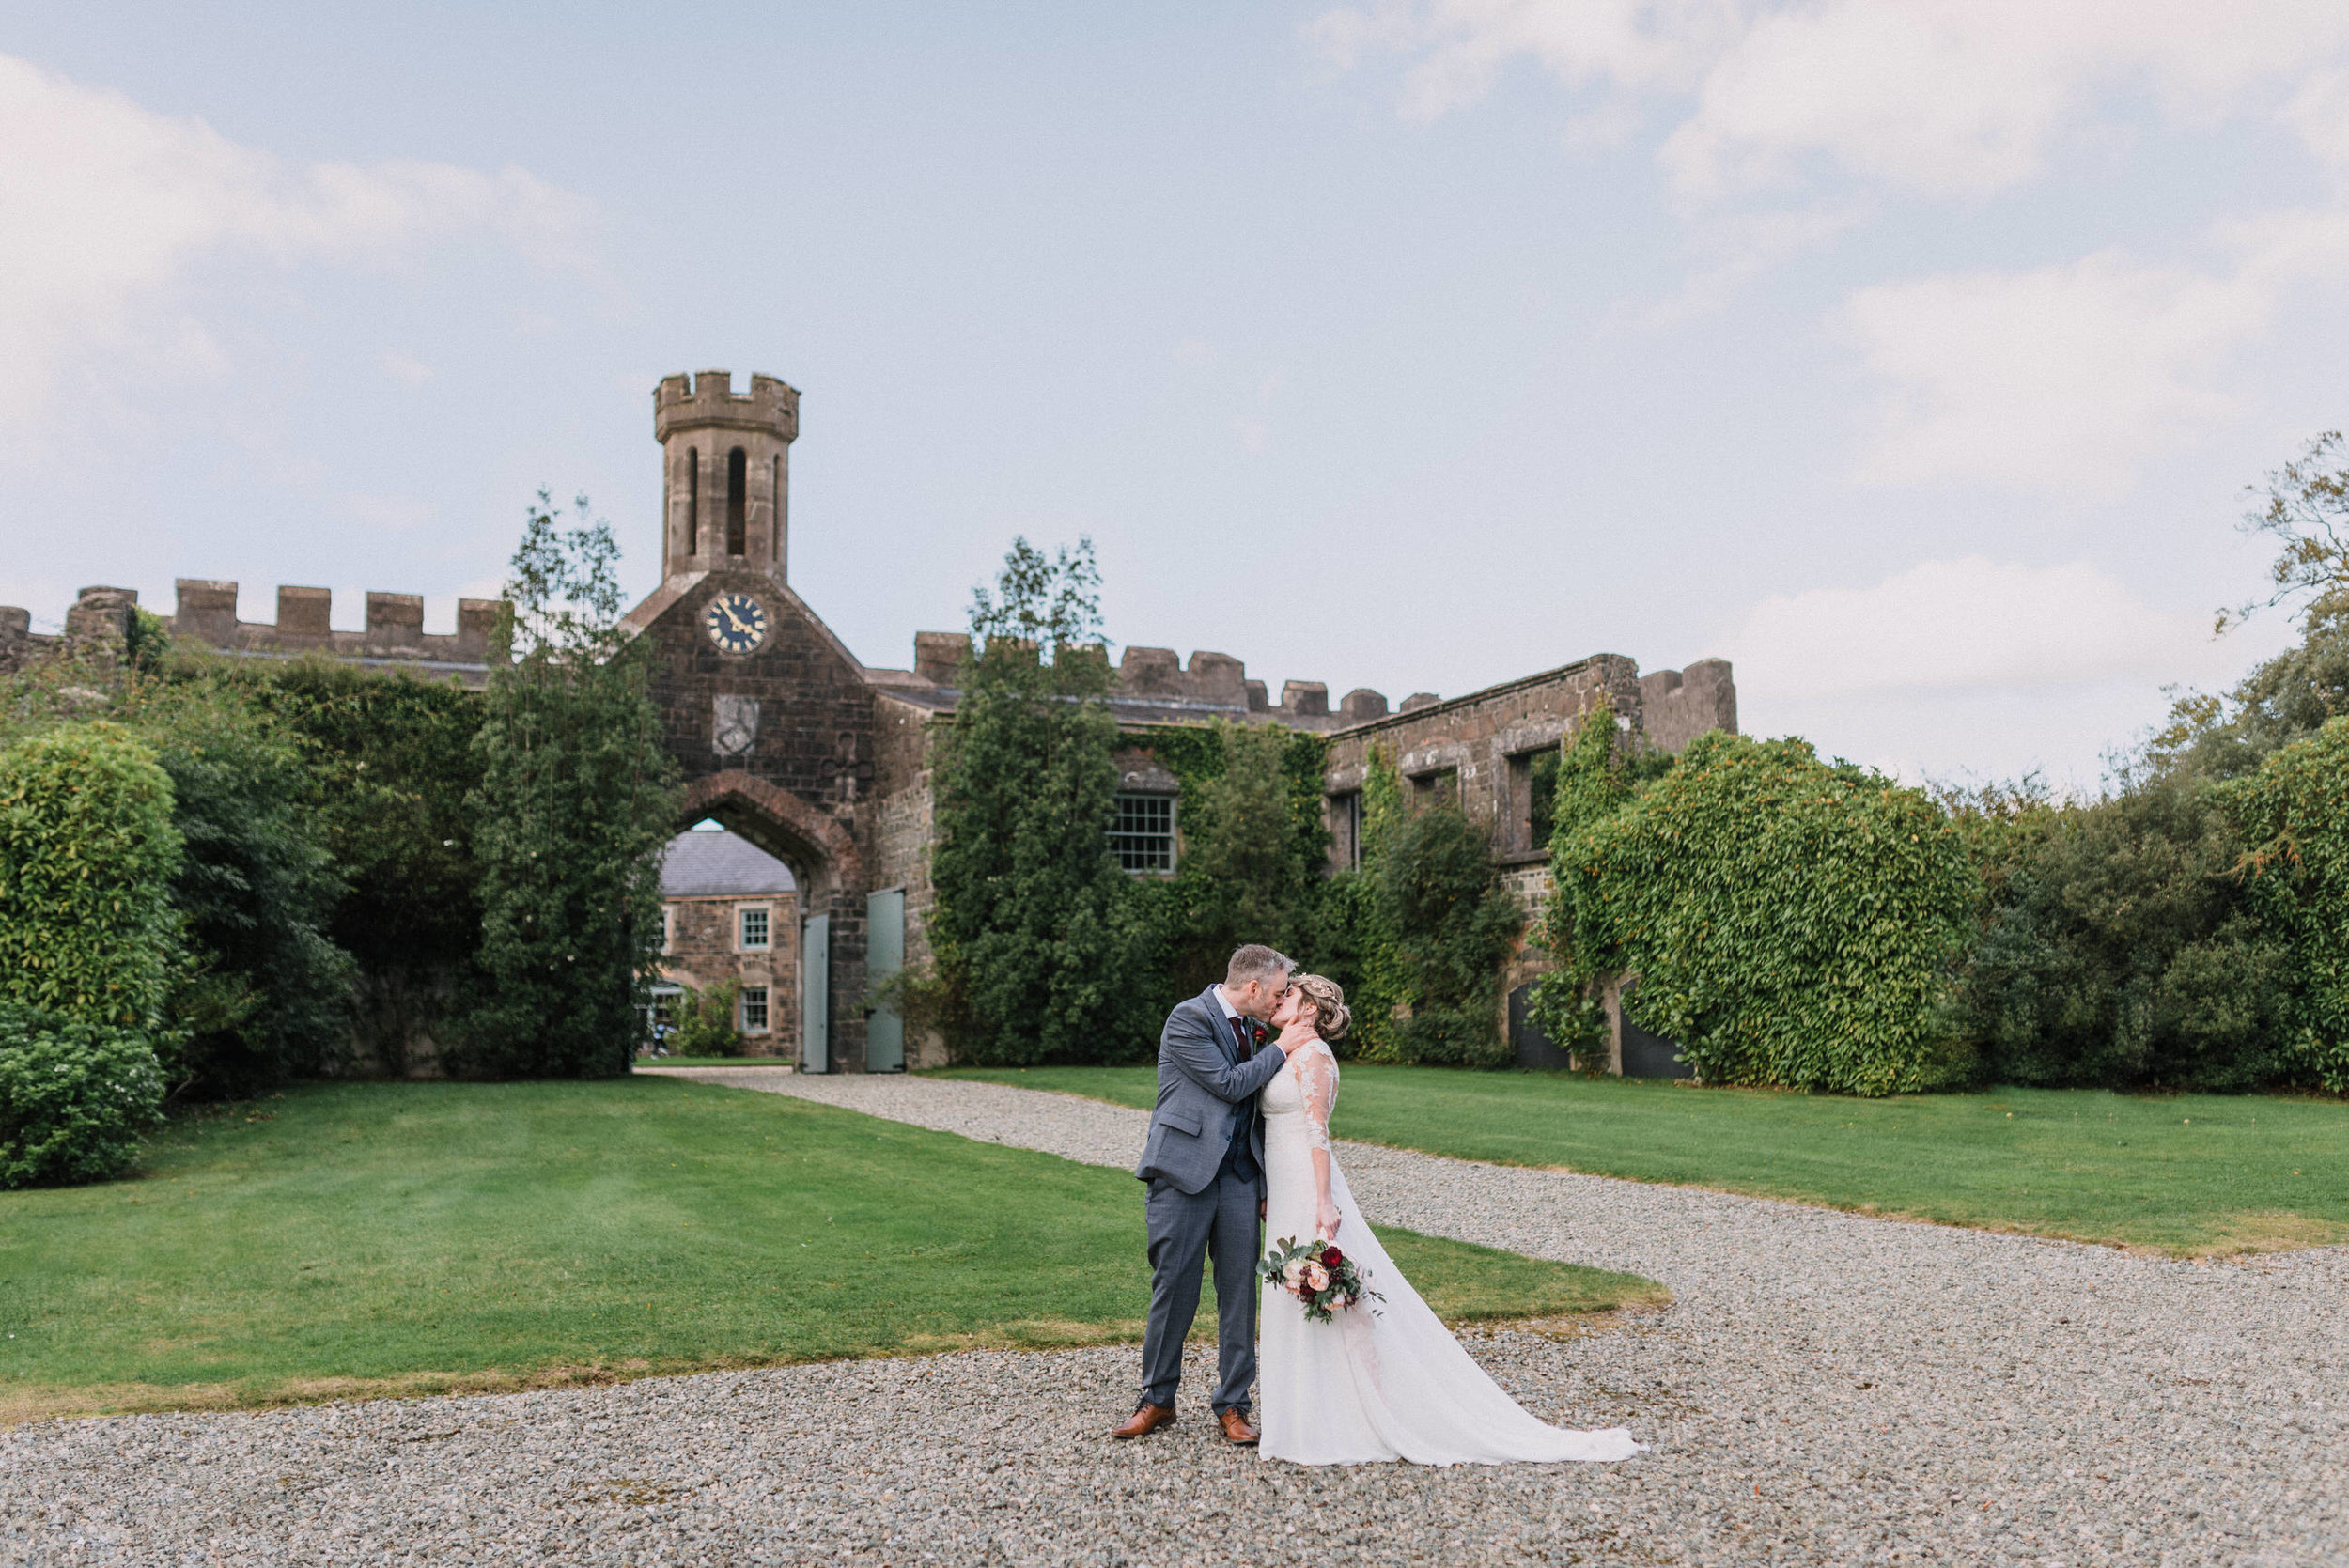 lissanoure castle wedding, northern ireland wedding photographer, romantic northern irish wedding venue, castle wedding ireland, natural wedding photography ni (87).jpg